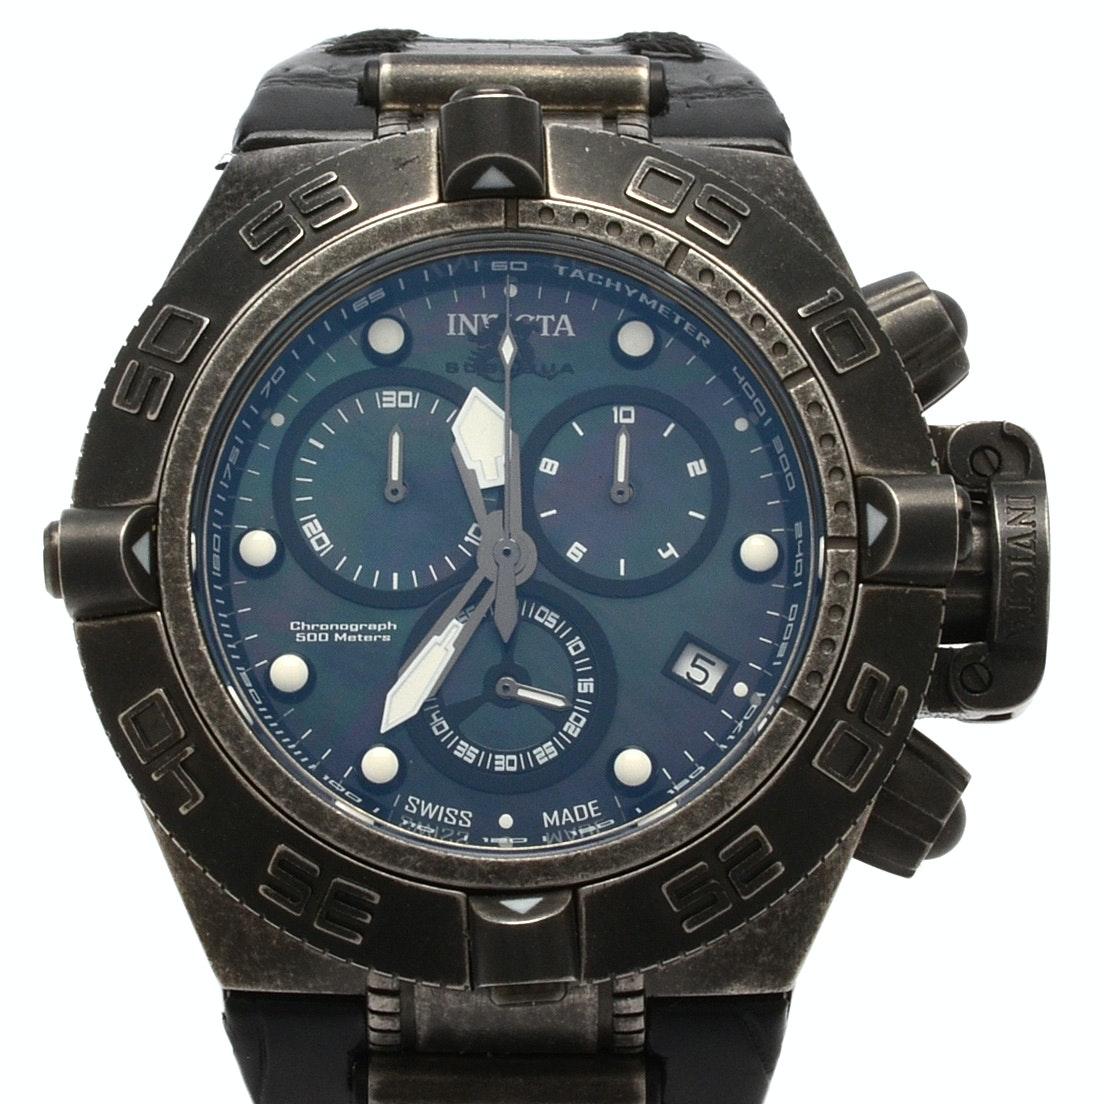 Invicta Sub Aqua Chronograph